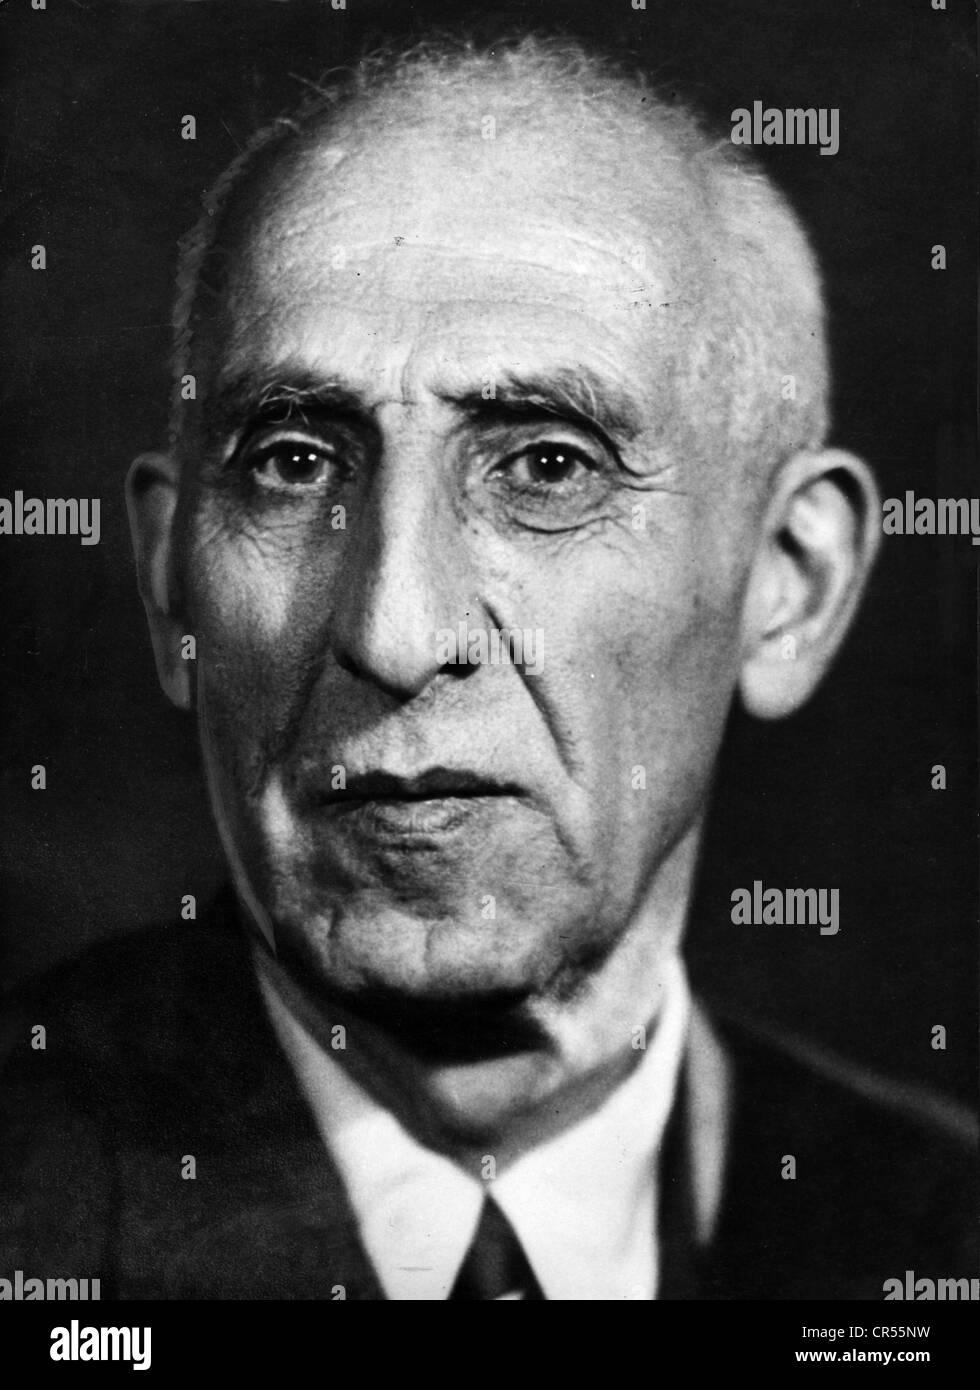 Mossadegh, Muhammad, circa 1881 - 5.3.1967, Iran politician (national front), Prime Minister 1951 - 1953, portrait, - Stock Image